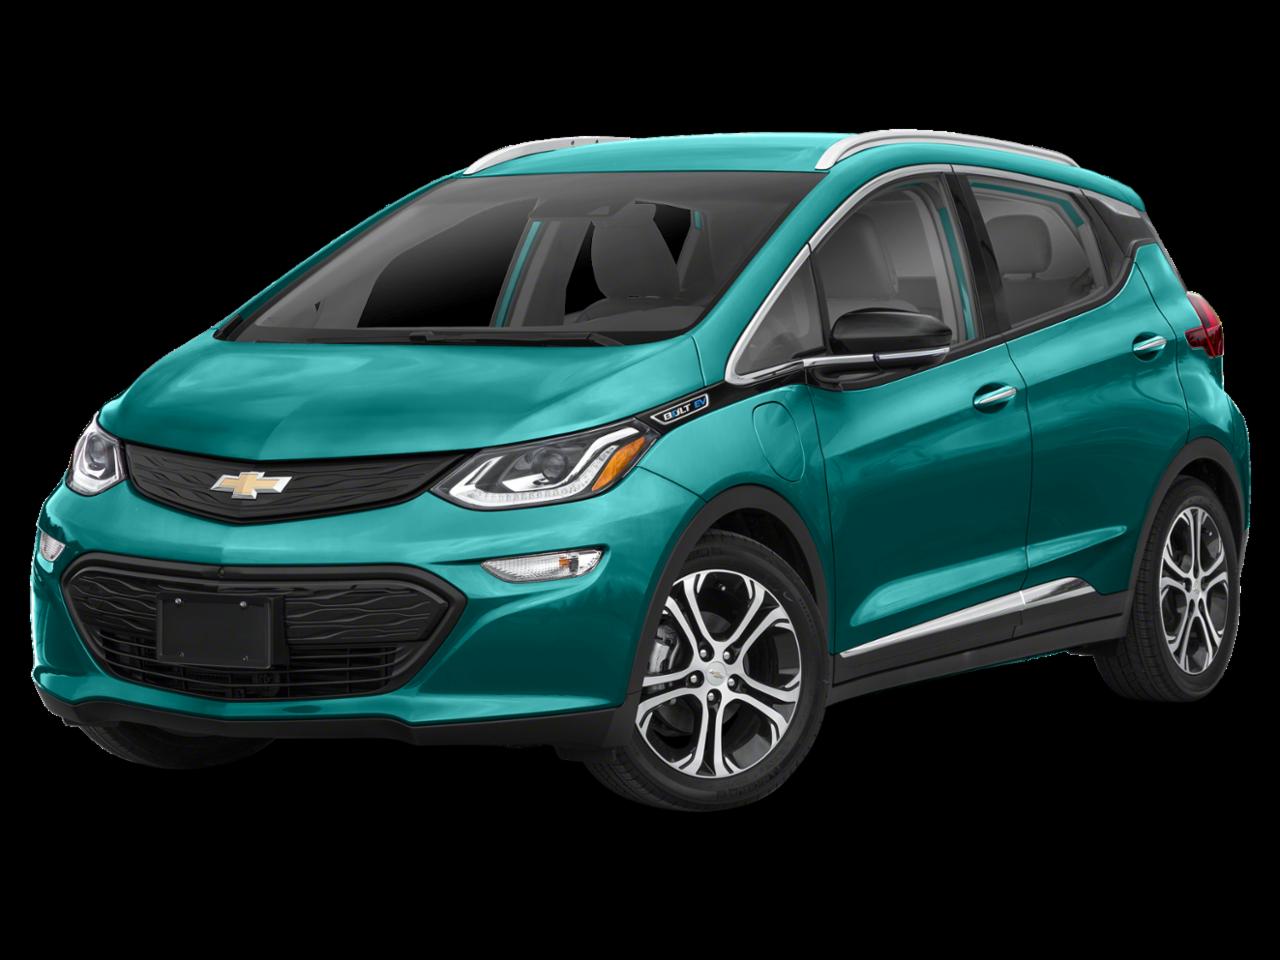 Chevrolet 2020 Bolt EV Premier